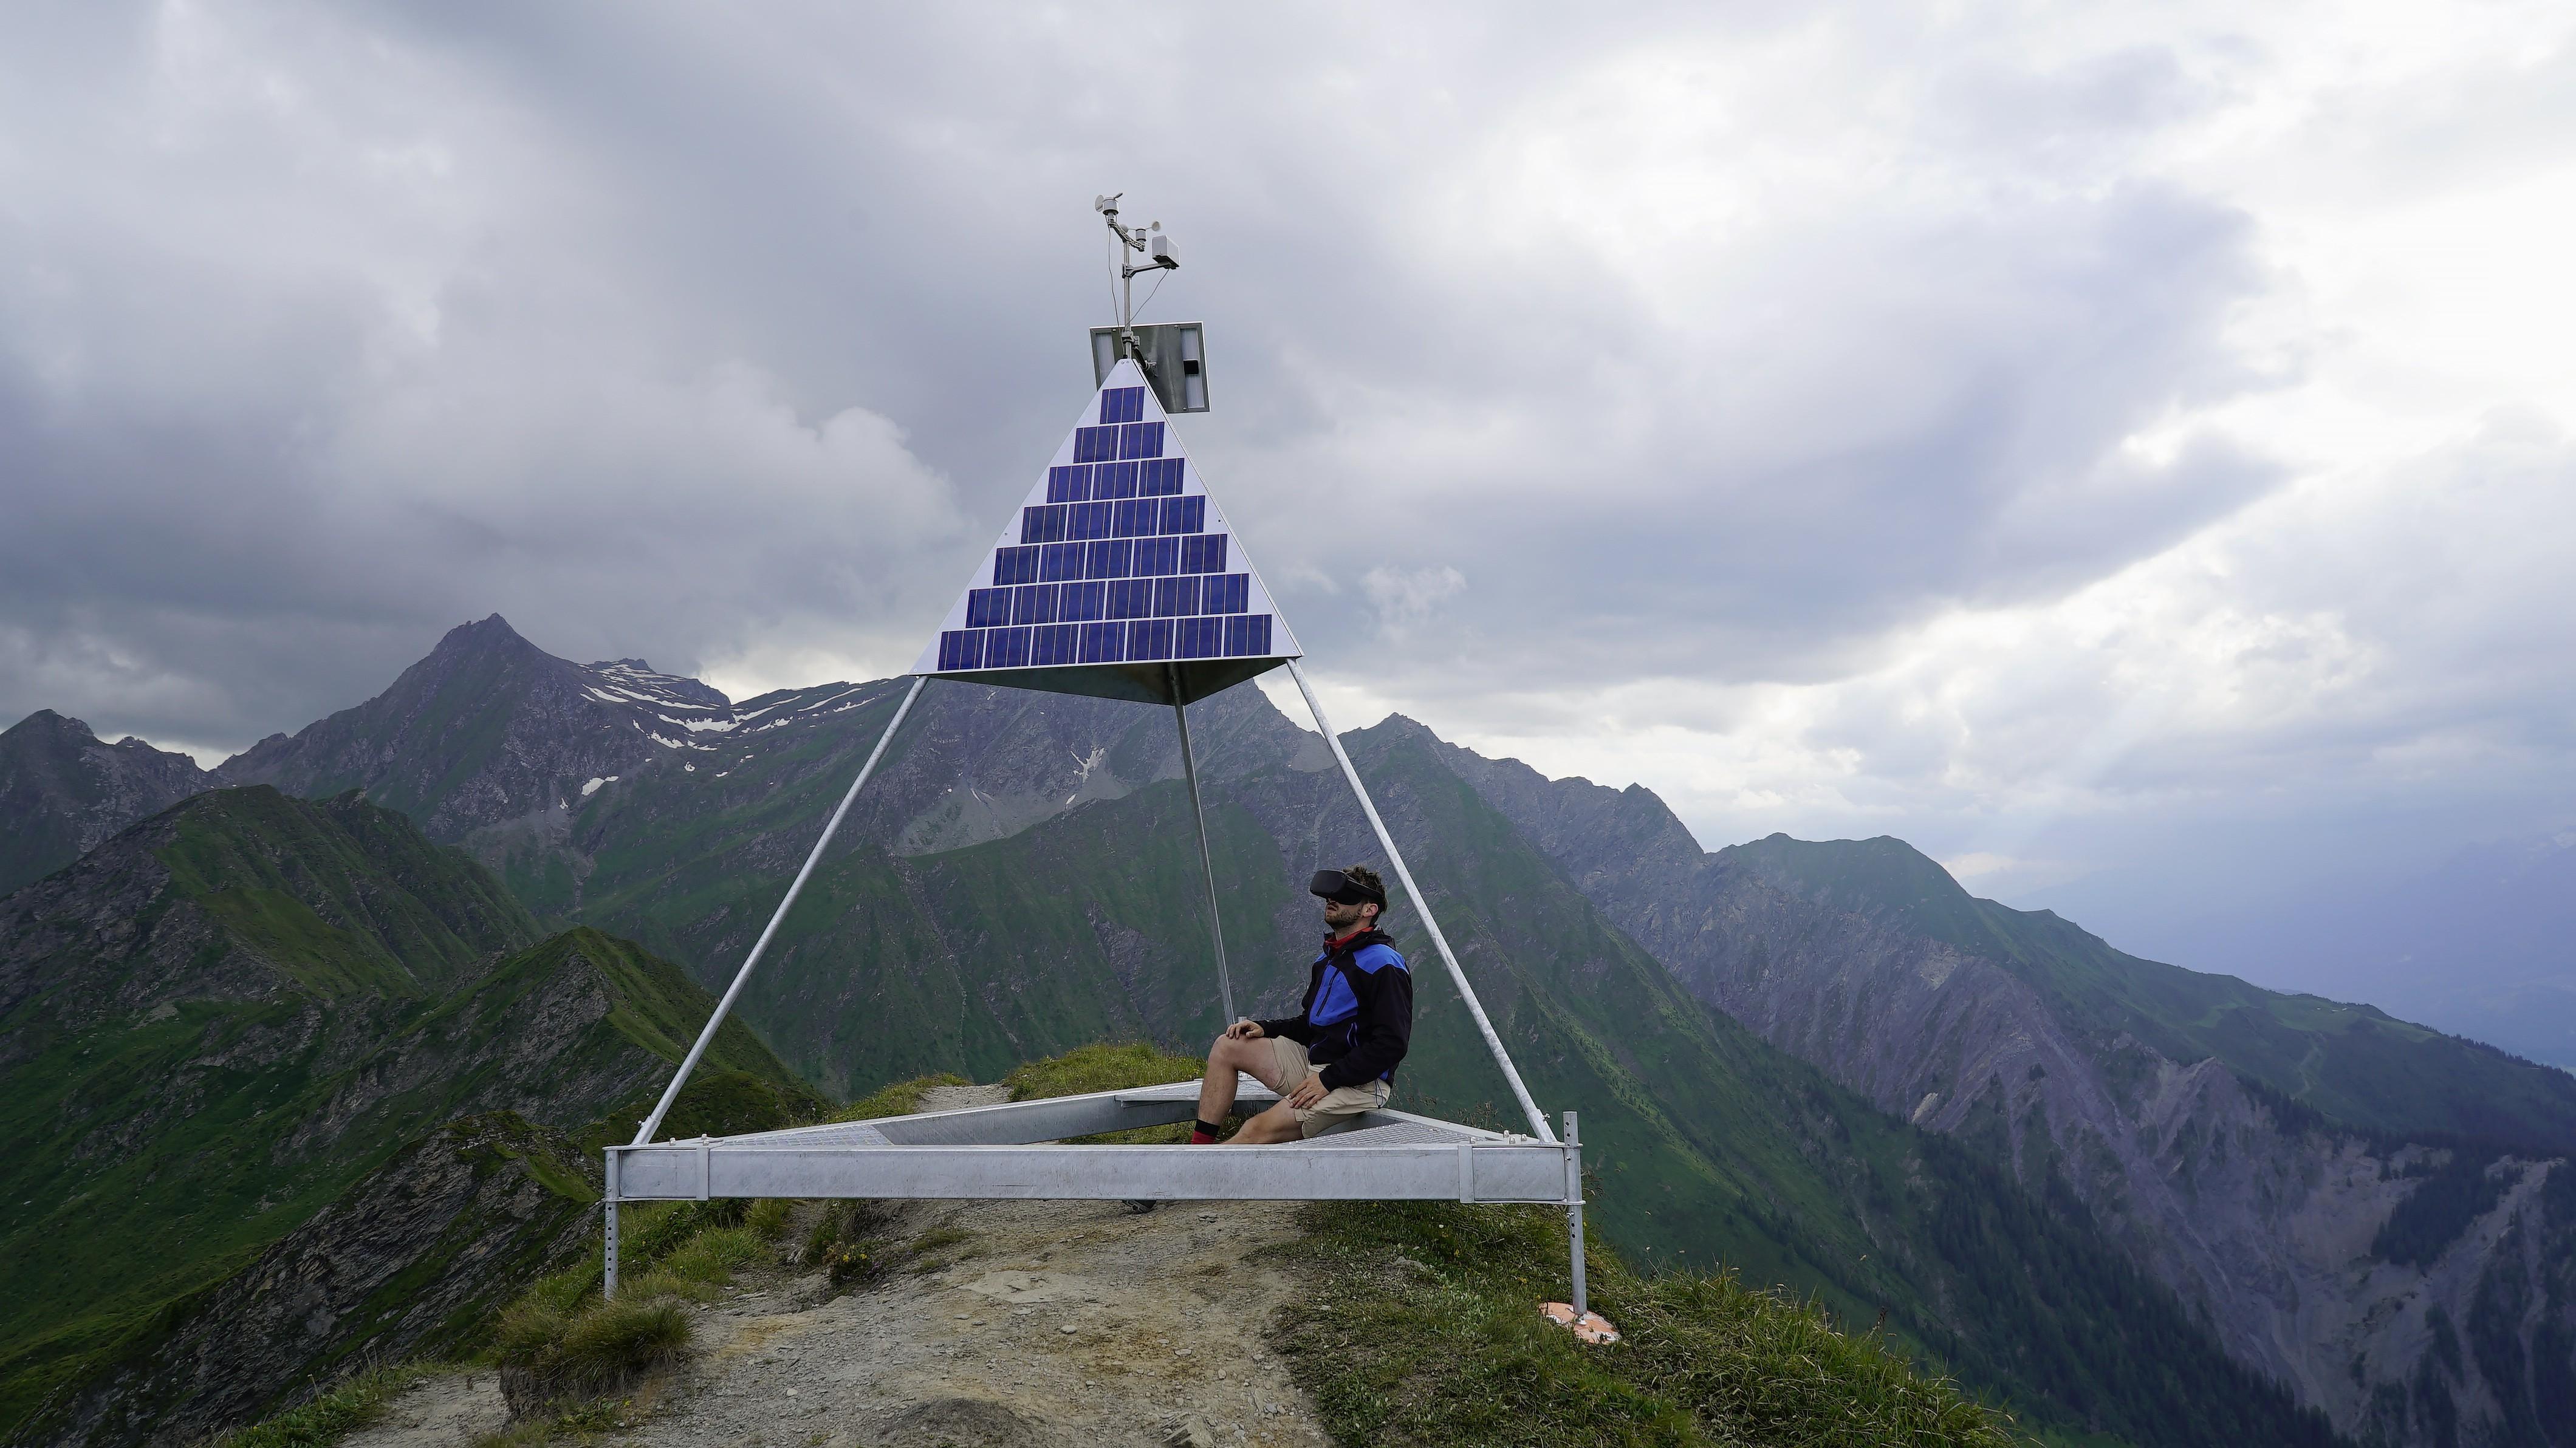 Solarbetriebene Wetterstation